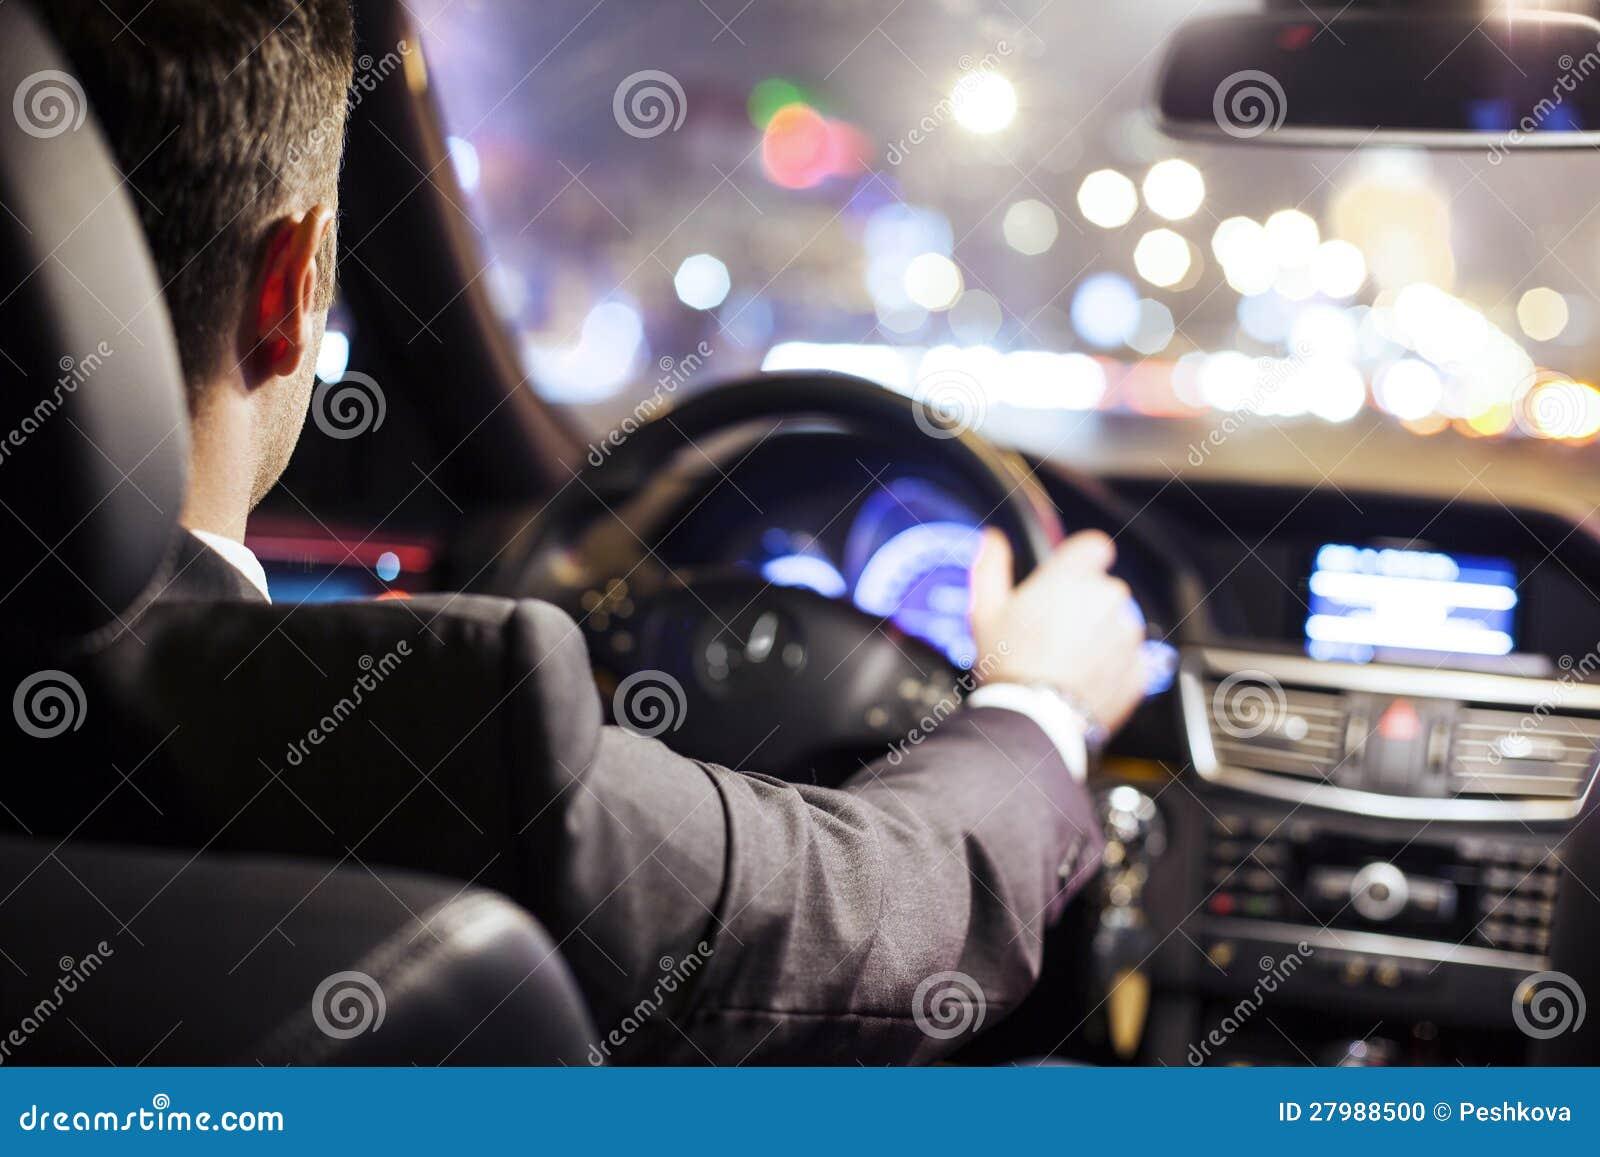 man driving car stock photo image 27988500